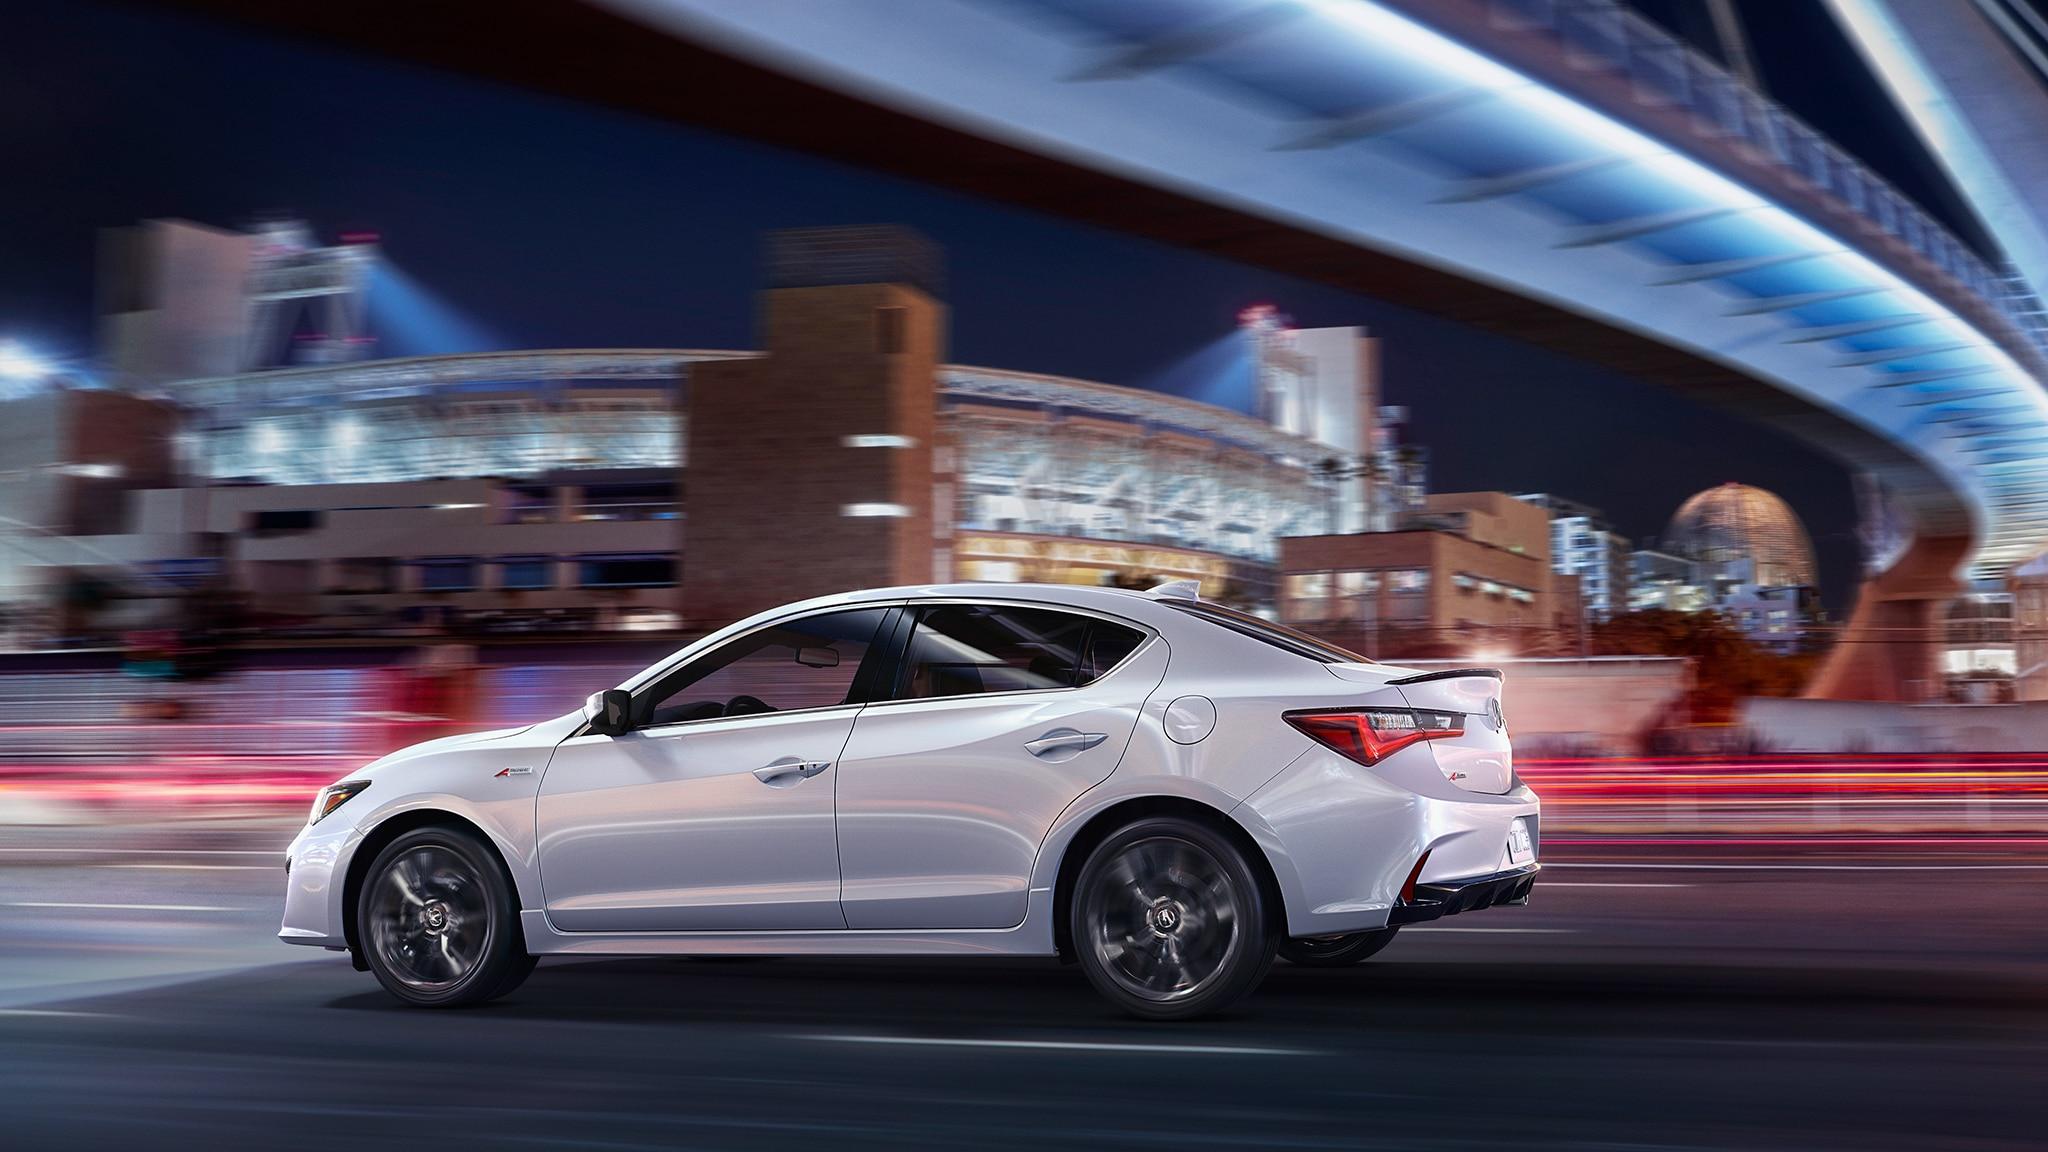 Refreshed 2019 Acura ILX Sports A Meaner Mug